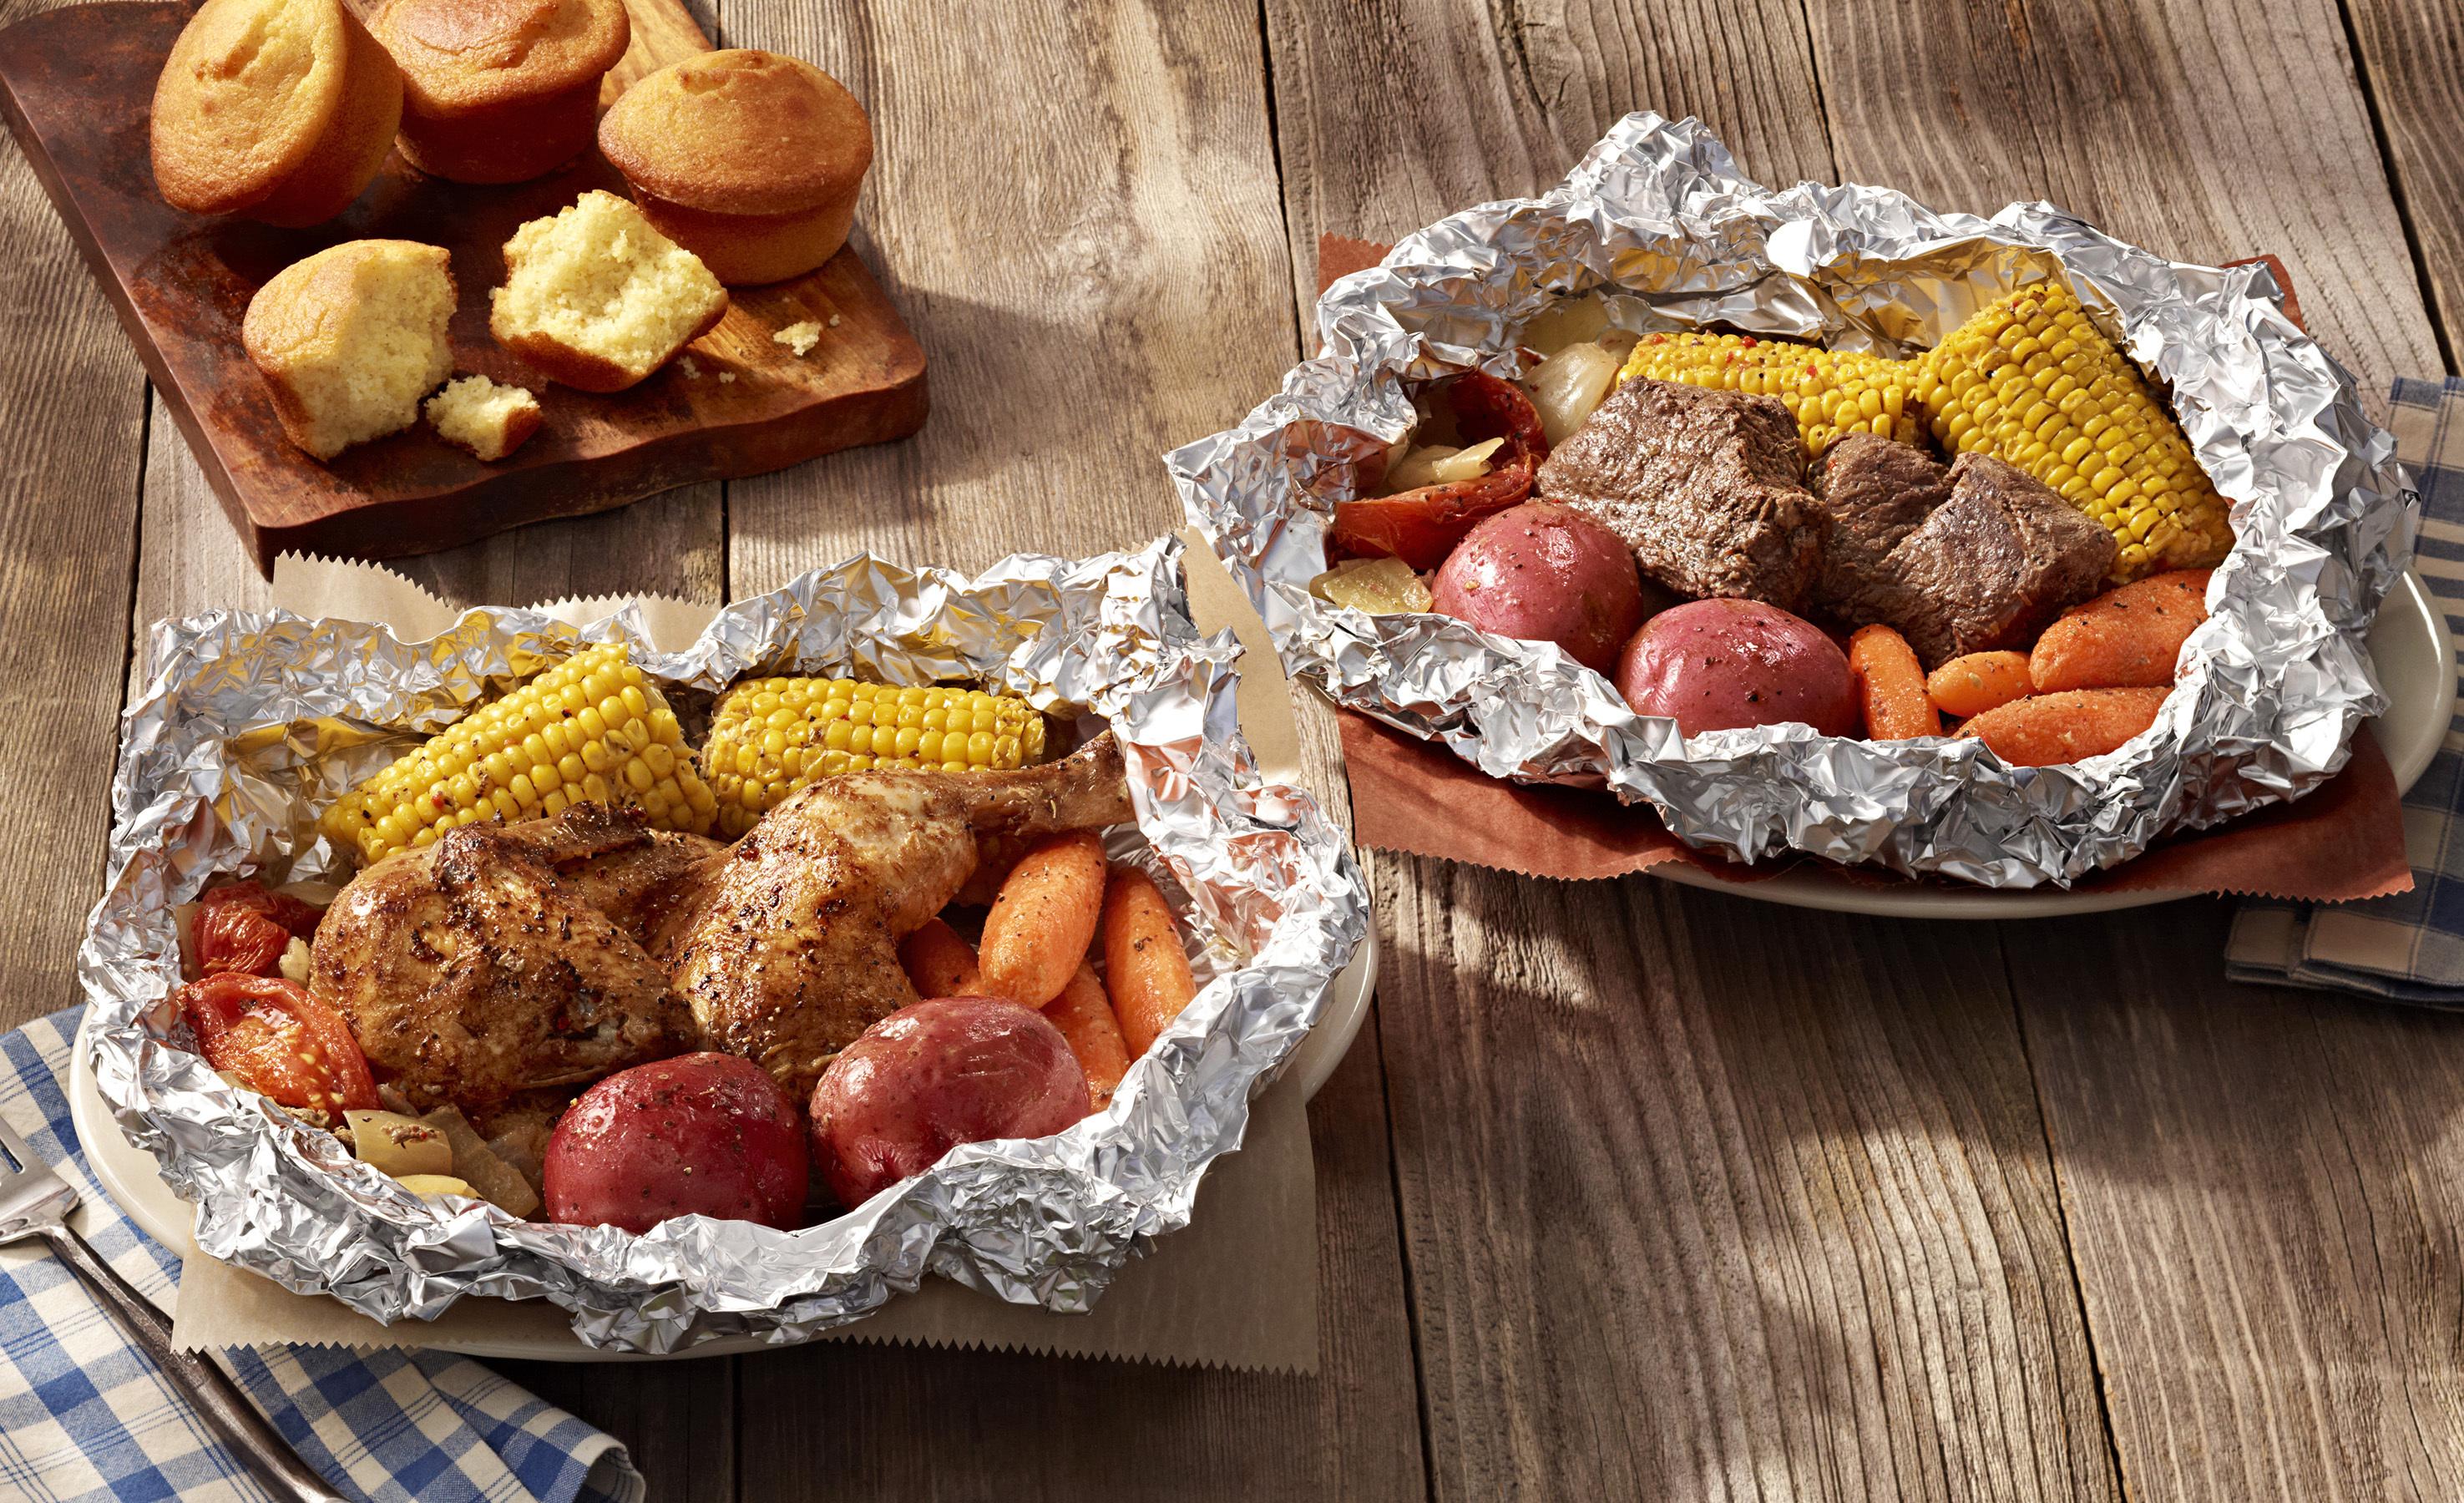 Cracker Barrel Campfire Chicken and Beef